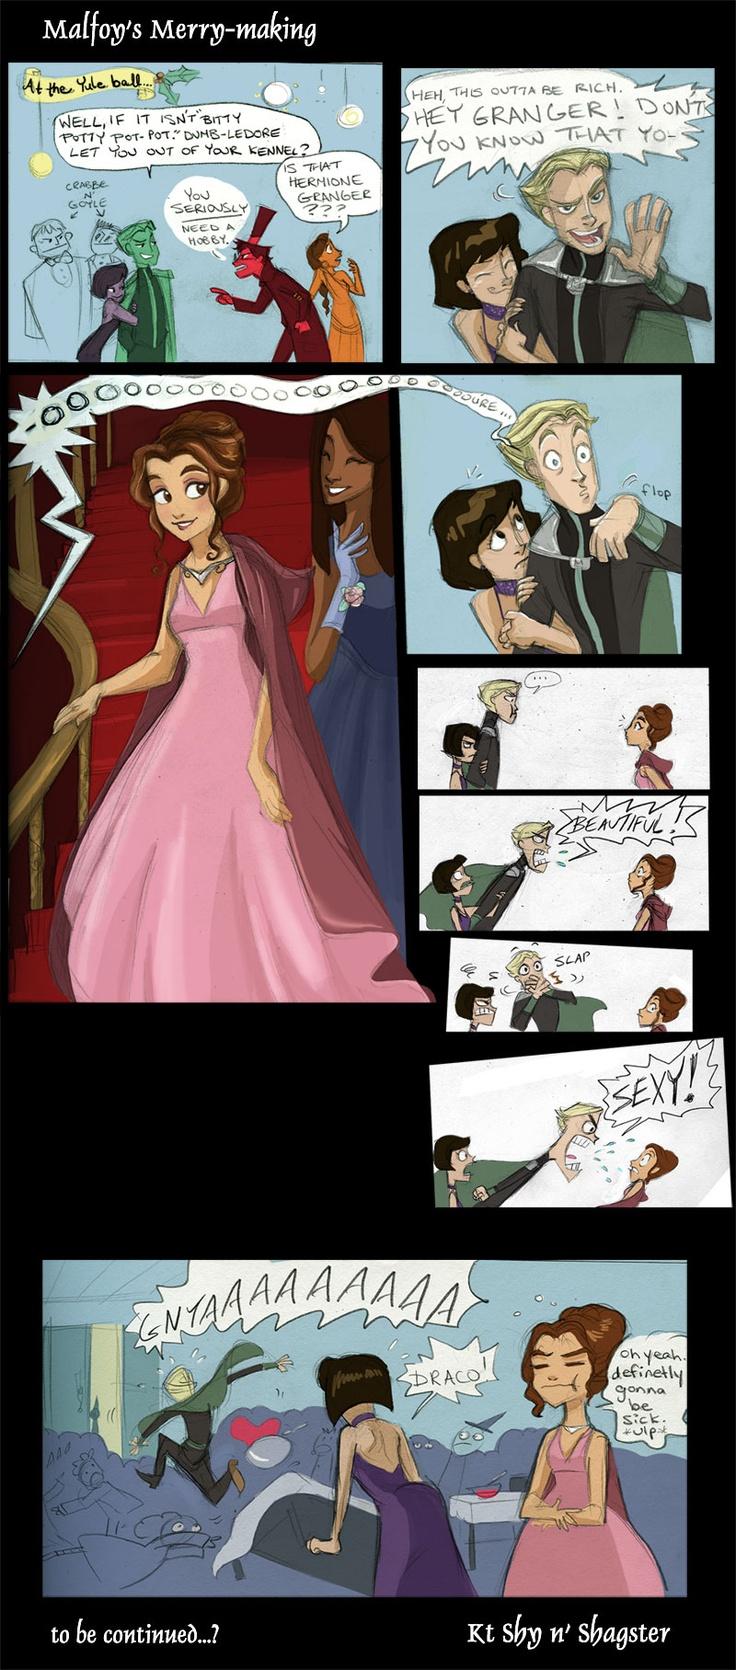 Ha! Gotta love Potter humor.